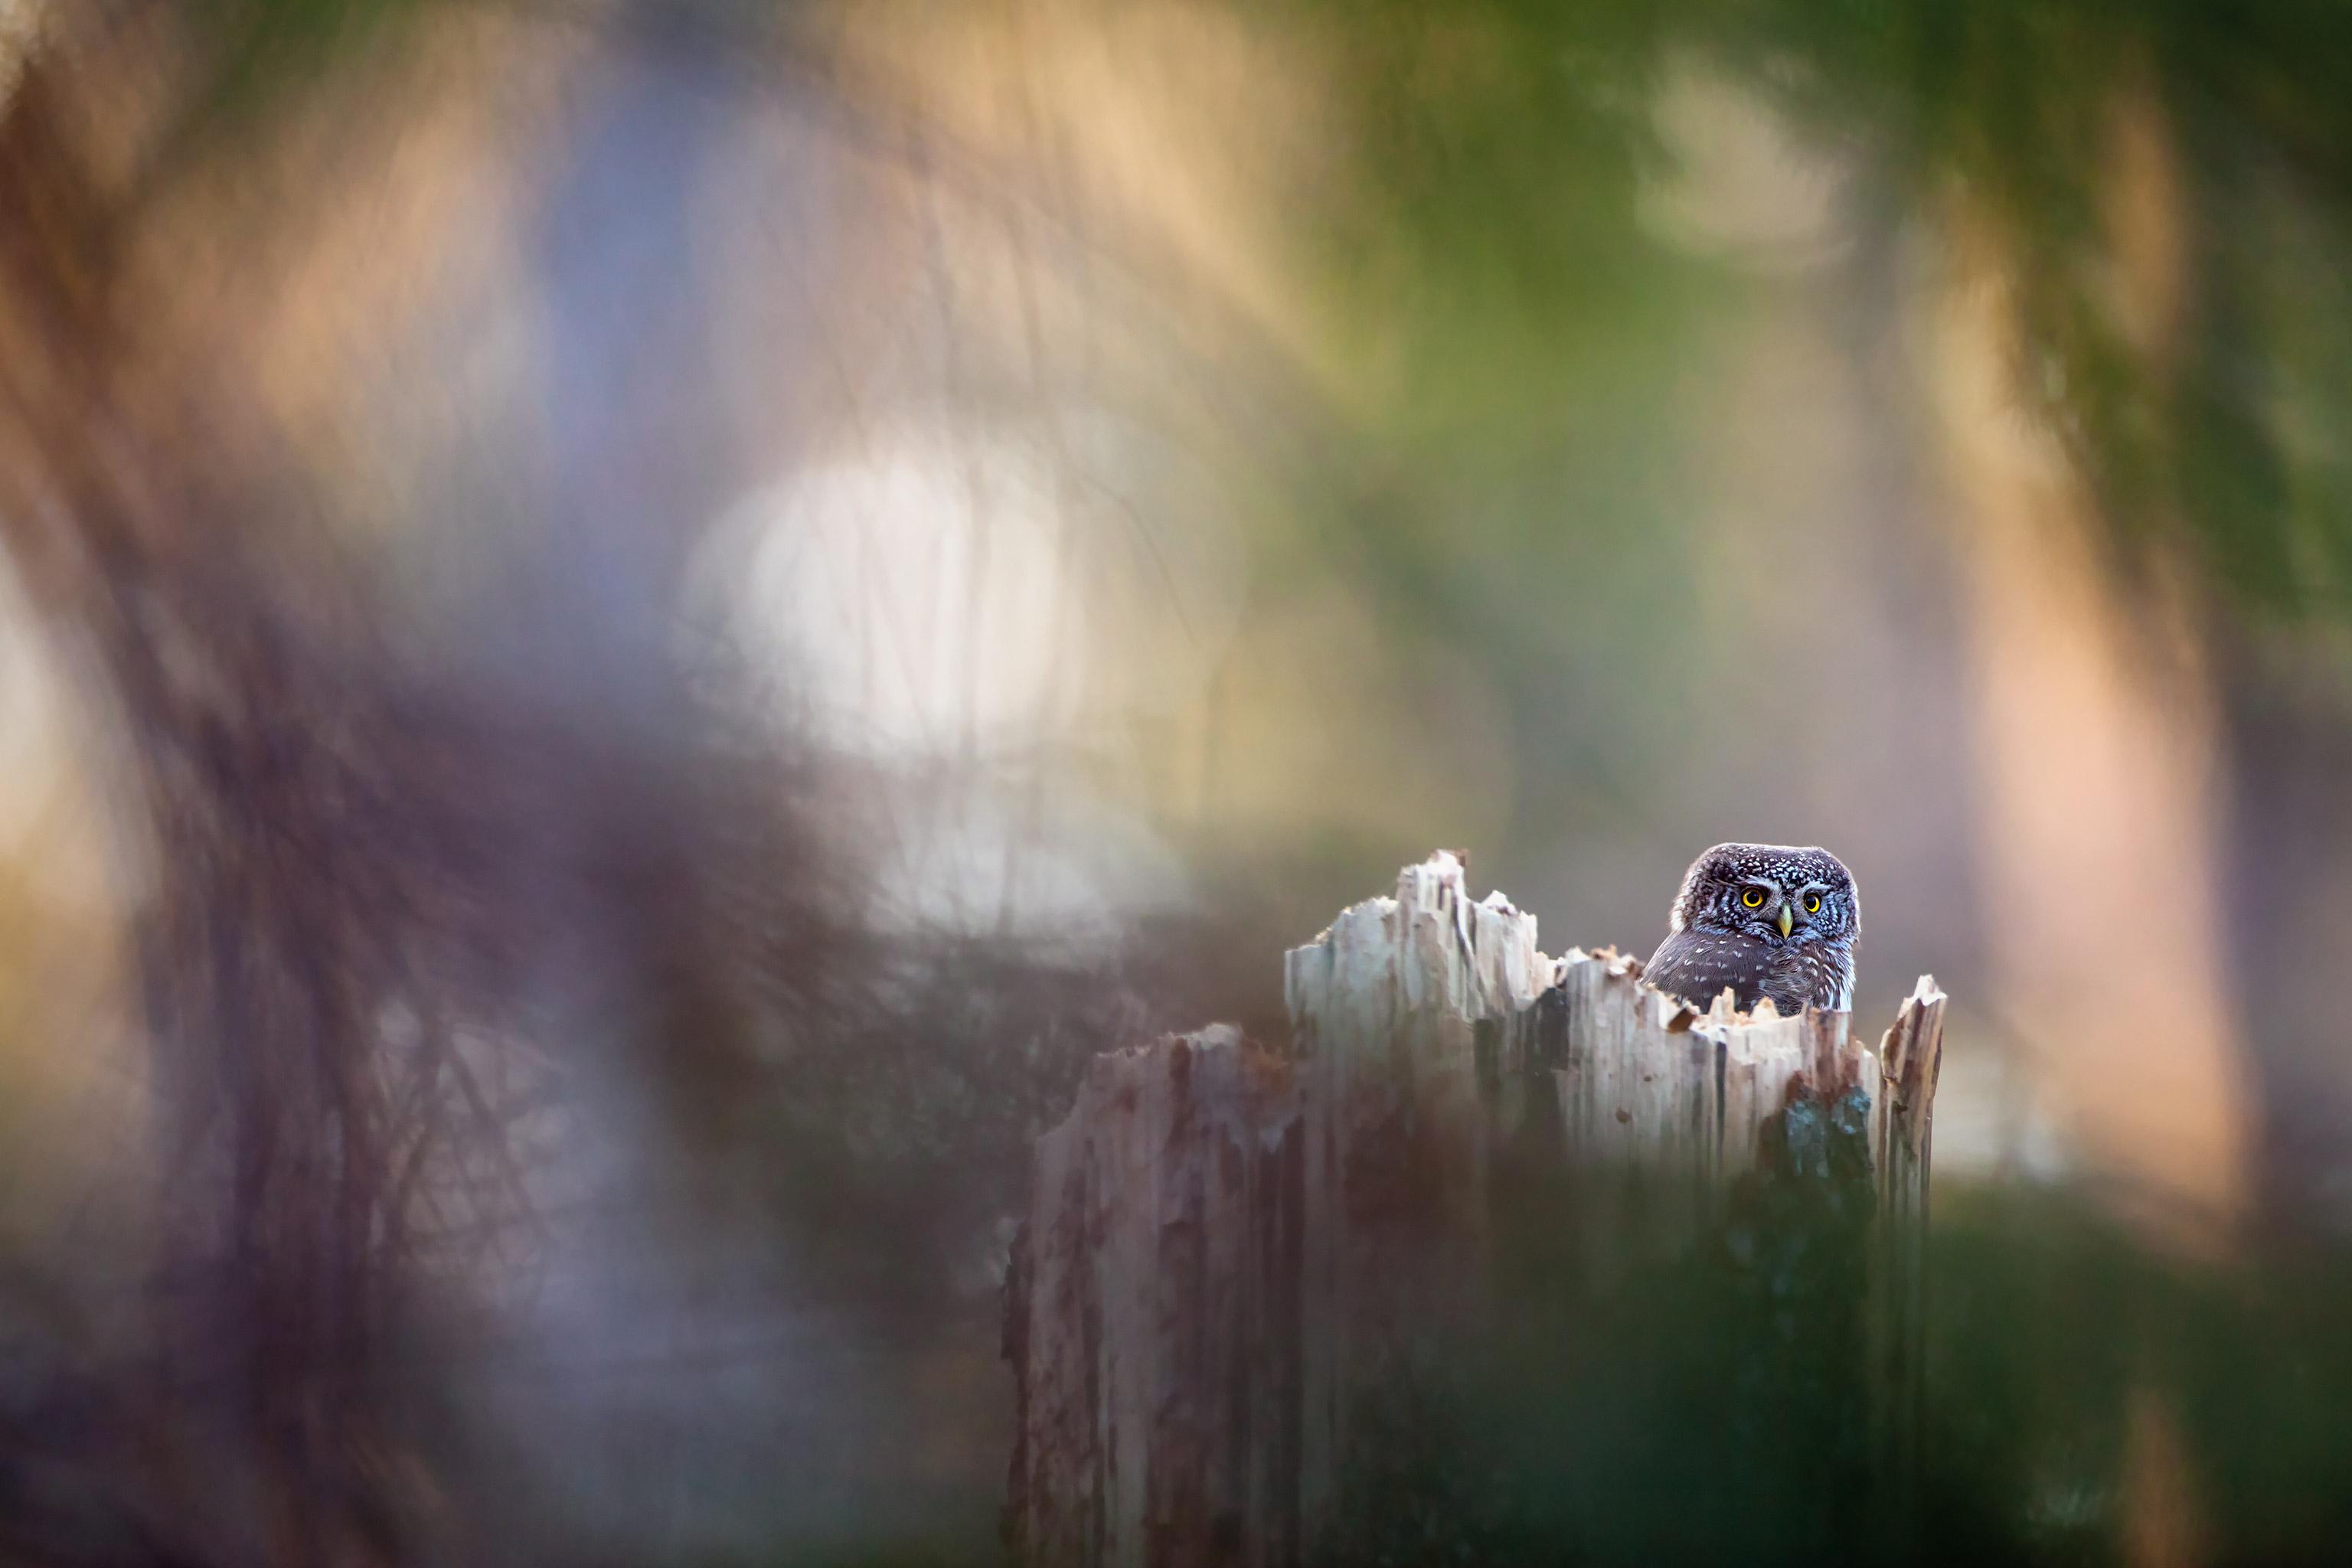 Pygmy Owl by Krzysztof Onikijuk